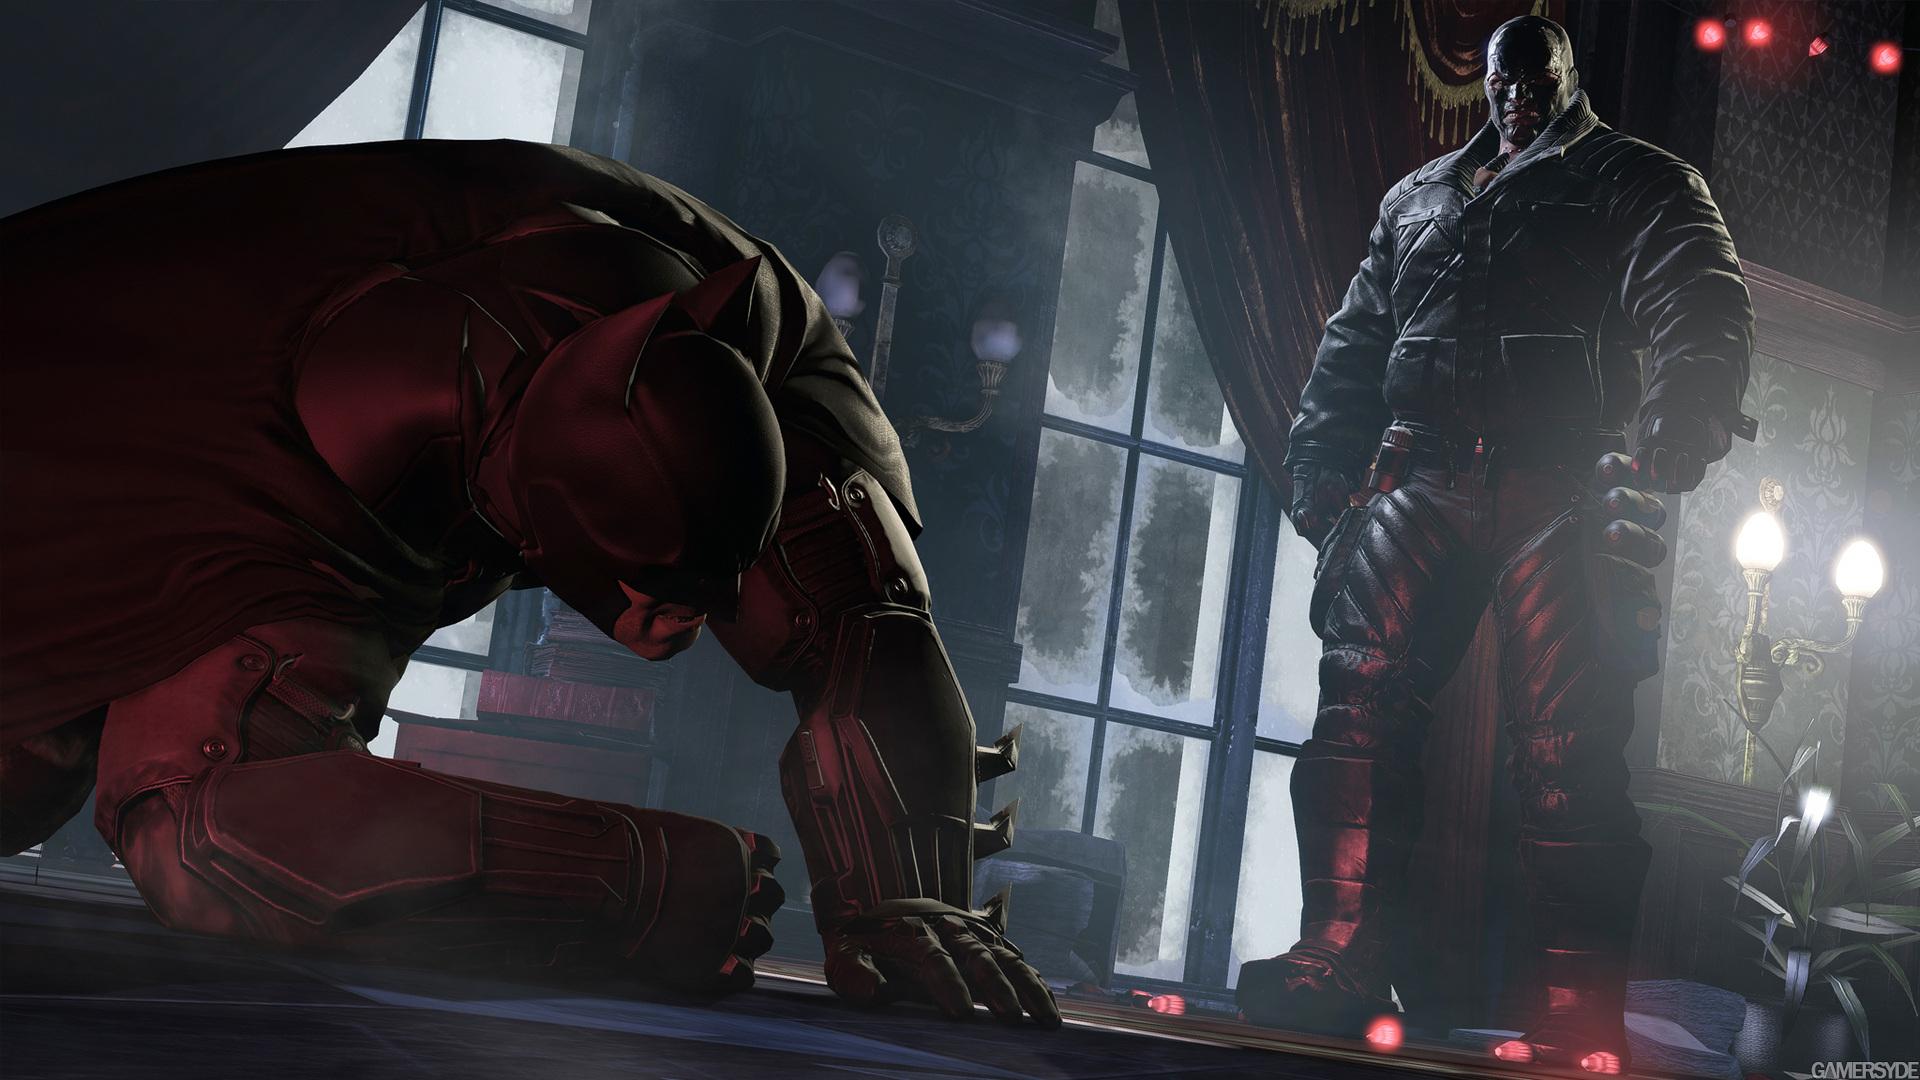 image batman arkham origins 22433 2694 0002 تصاویر جدید از عنوان Batman:Arkham Origins منتشر شد